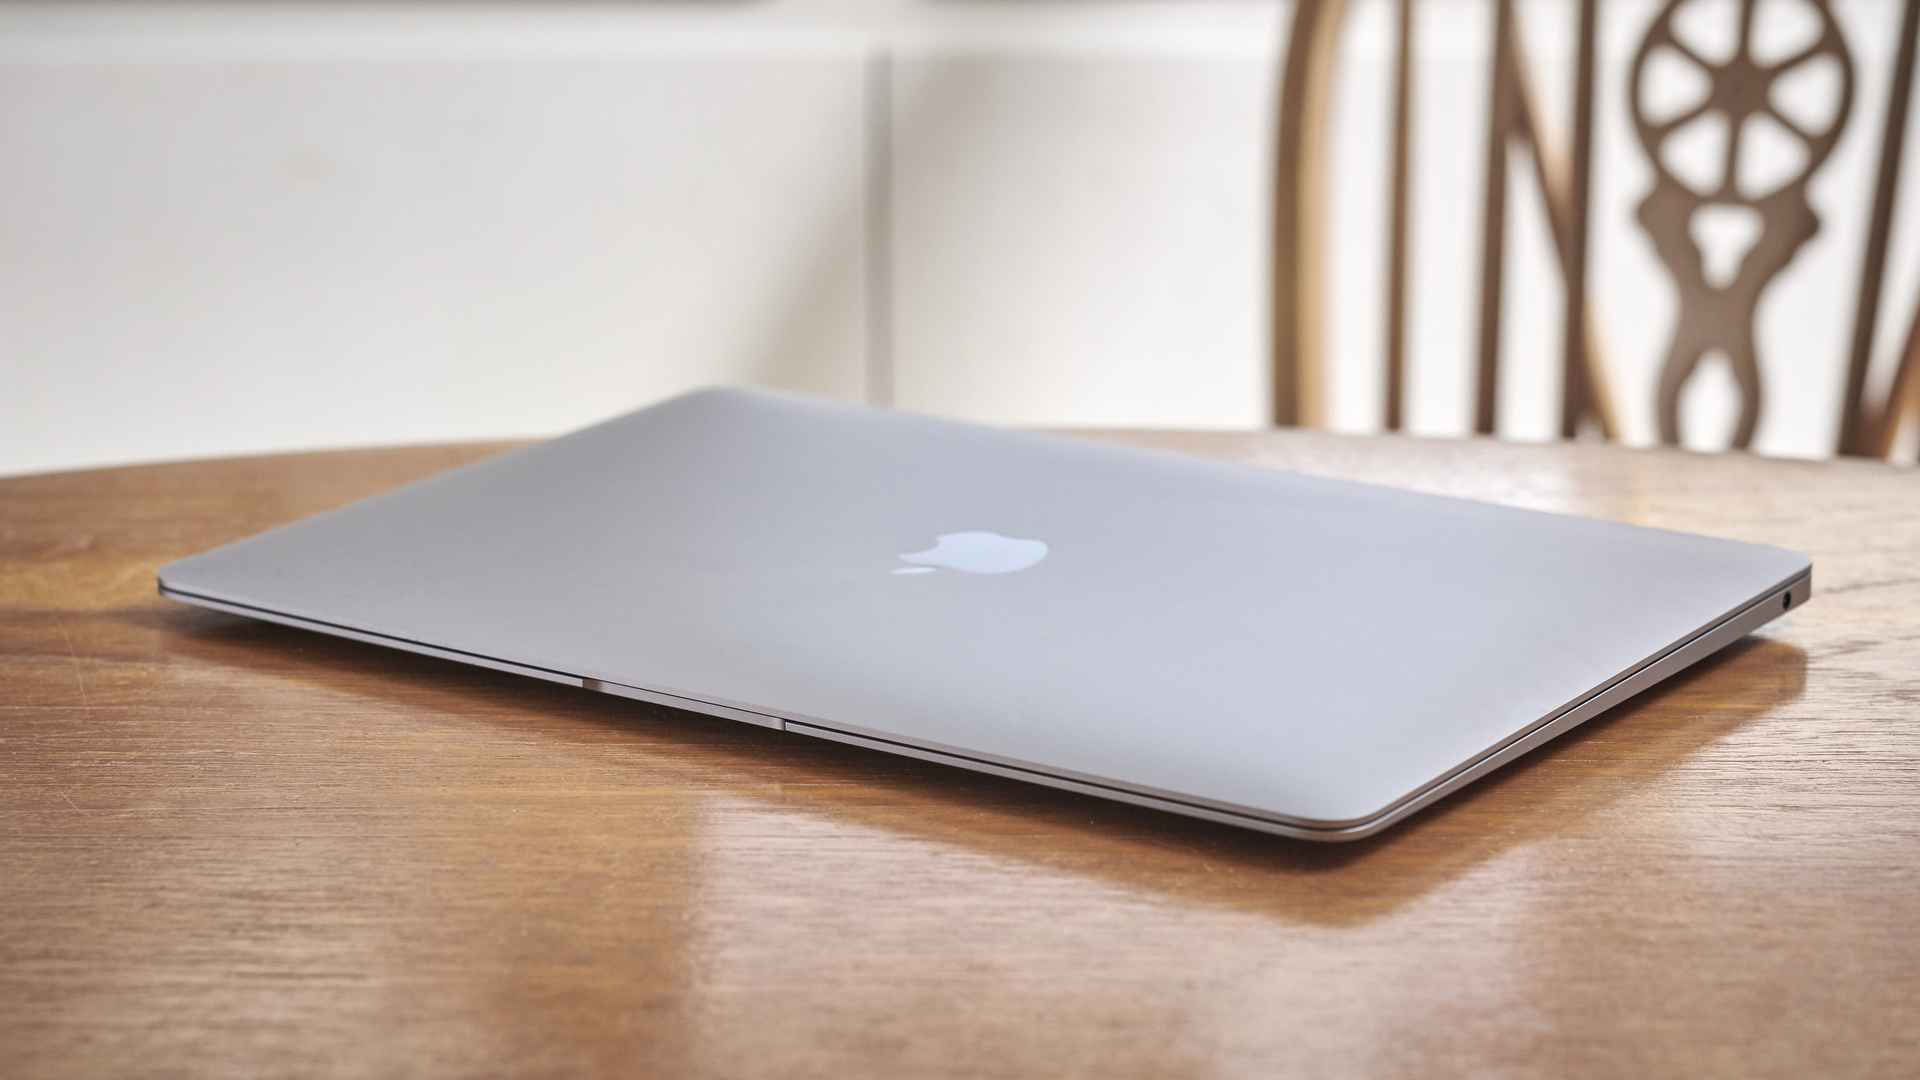 Apple abandonnerait progressivement Intel en 2021 — MacBook ARM